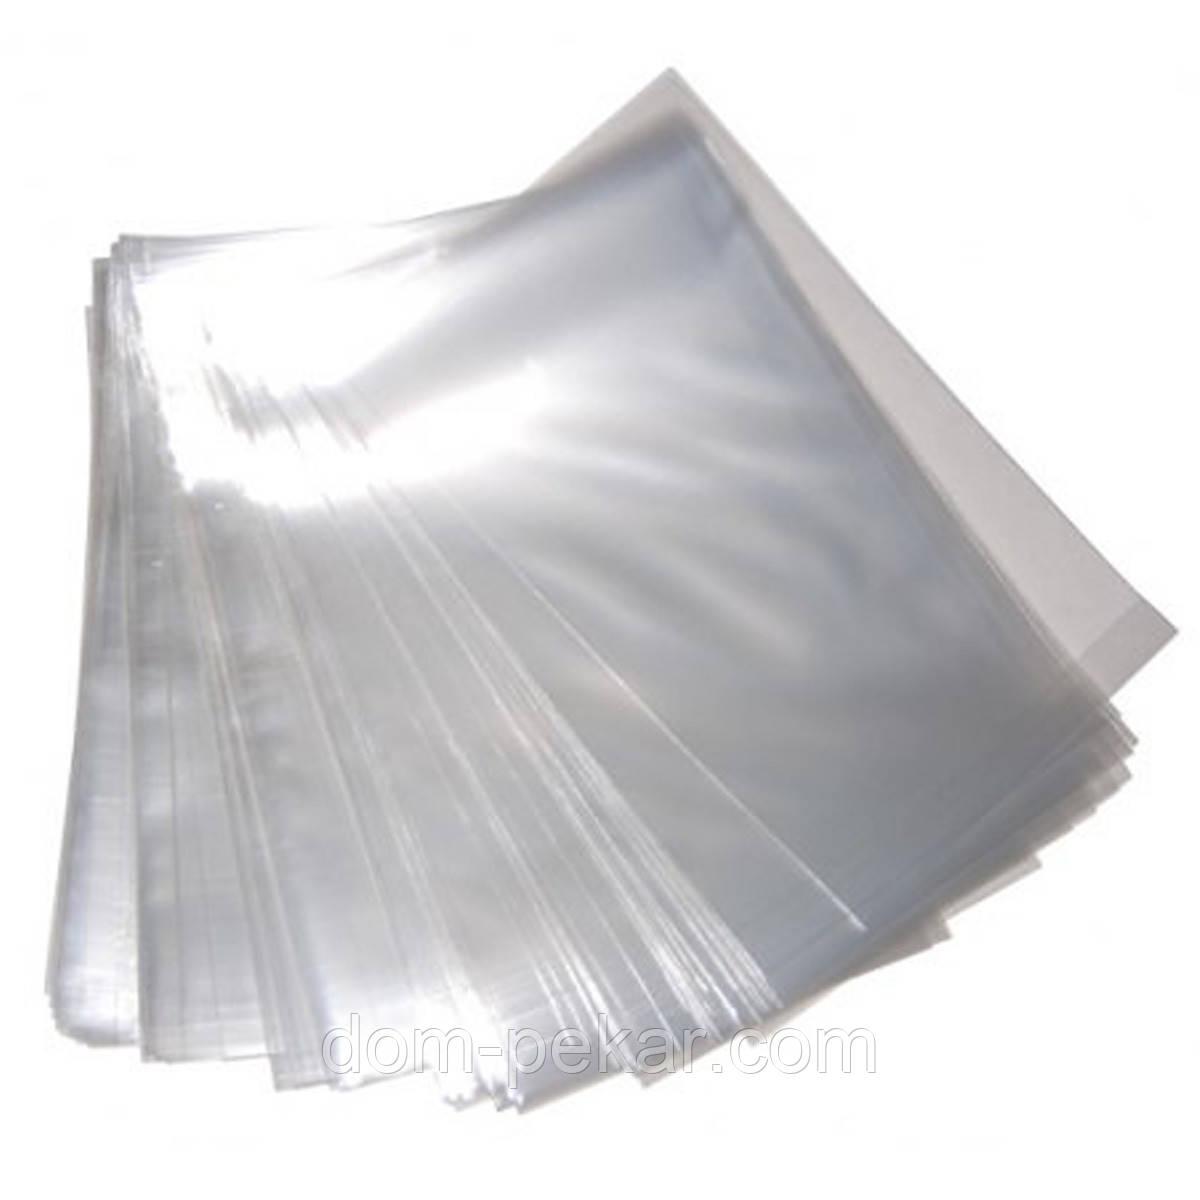 Пакет для упаковки Пасхи 220*350 мм (100 шт)